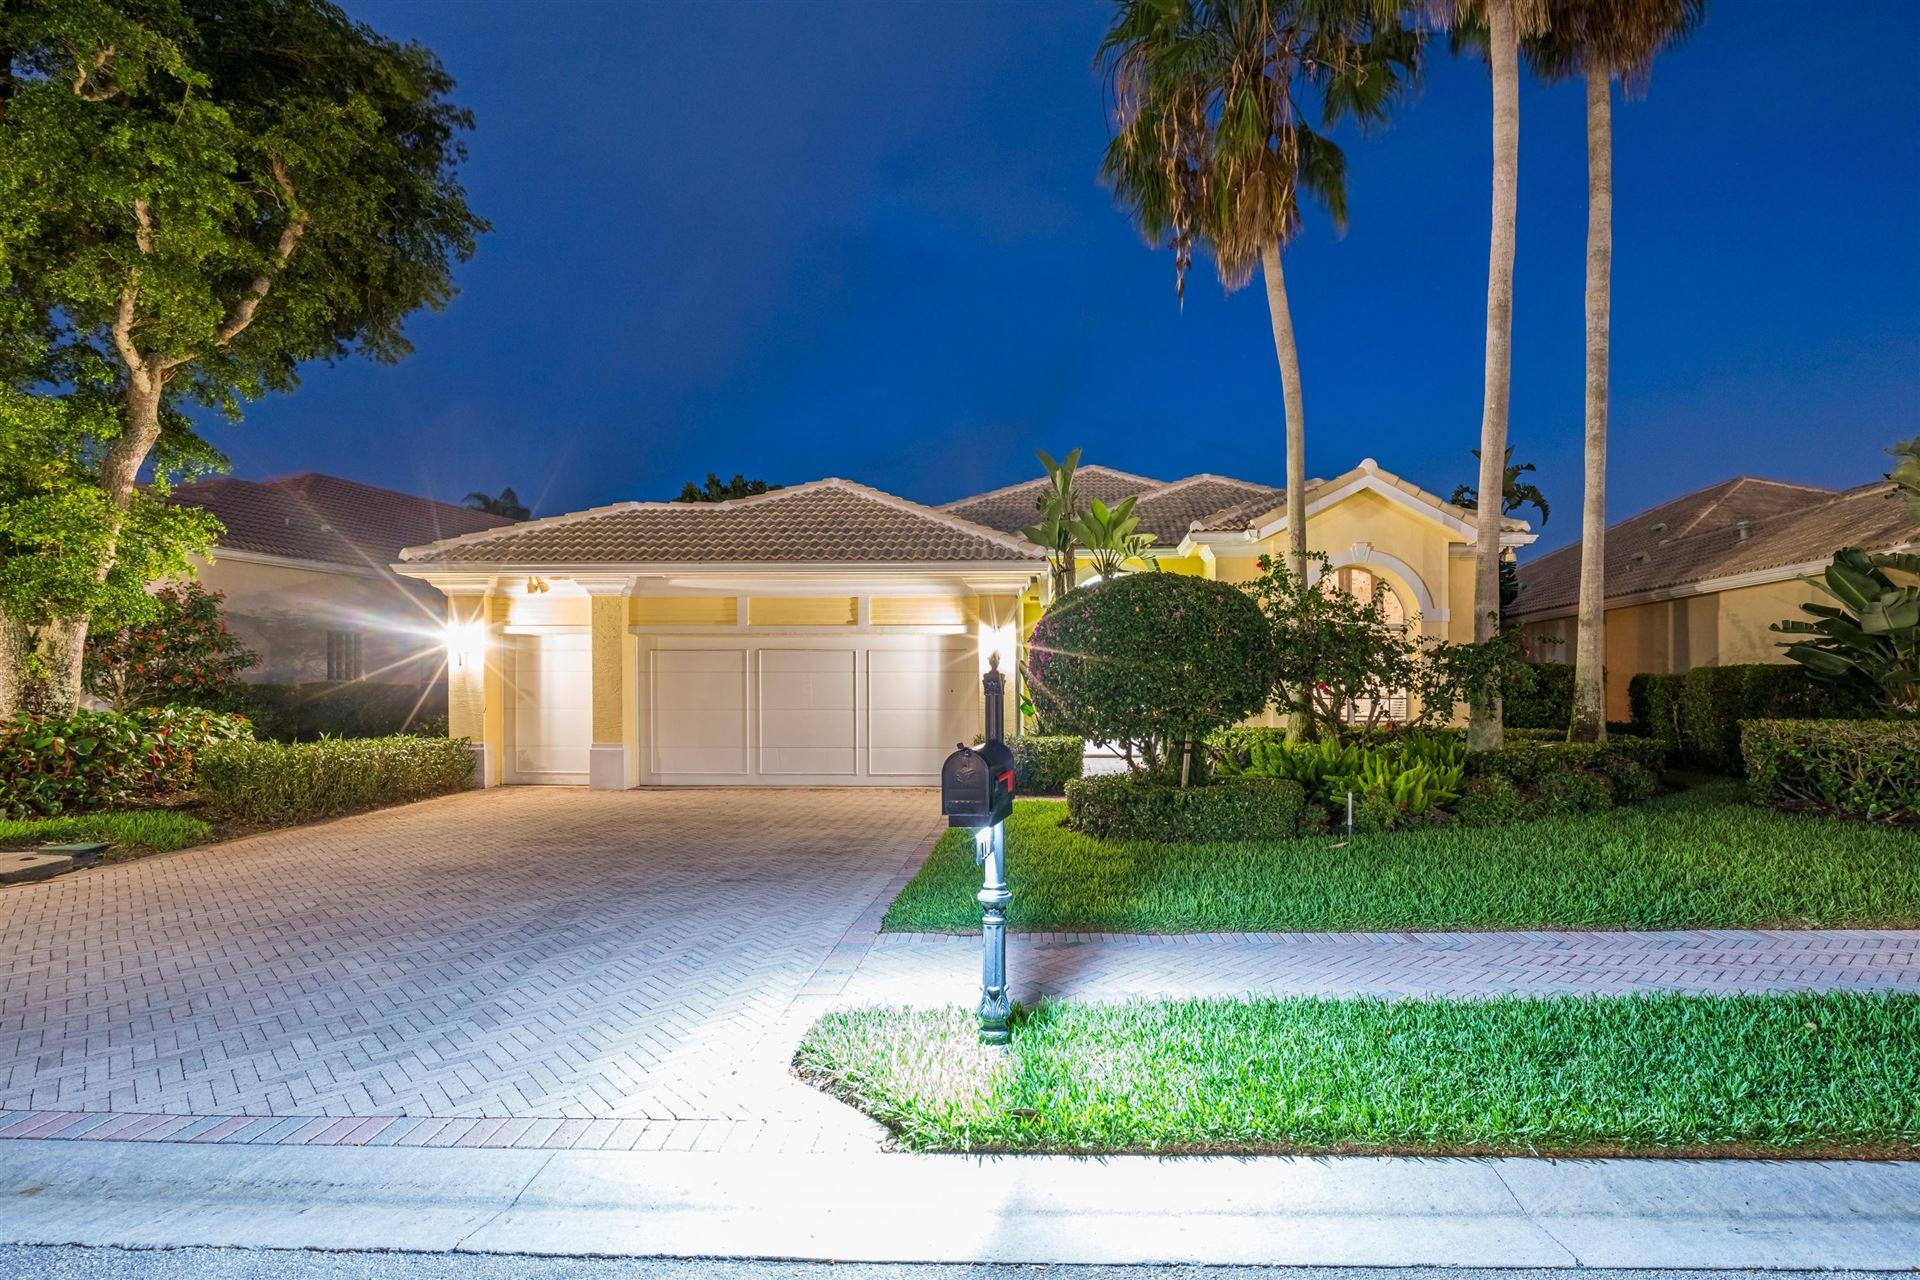 Photo of 117 Banyan Isle Drive, Palm Beach Gardens, FL 33418 (MLS # RX-10530583)